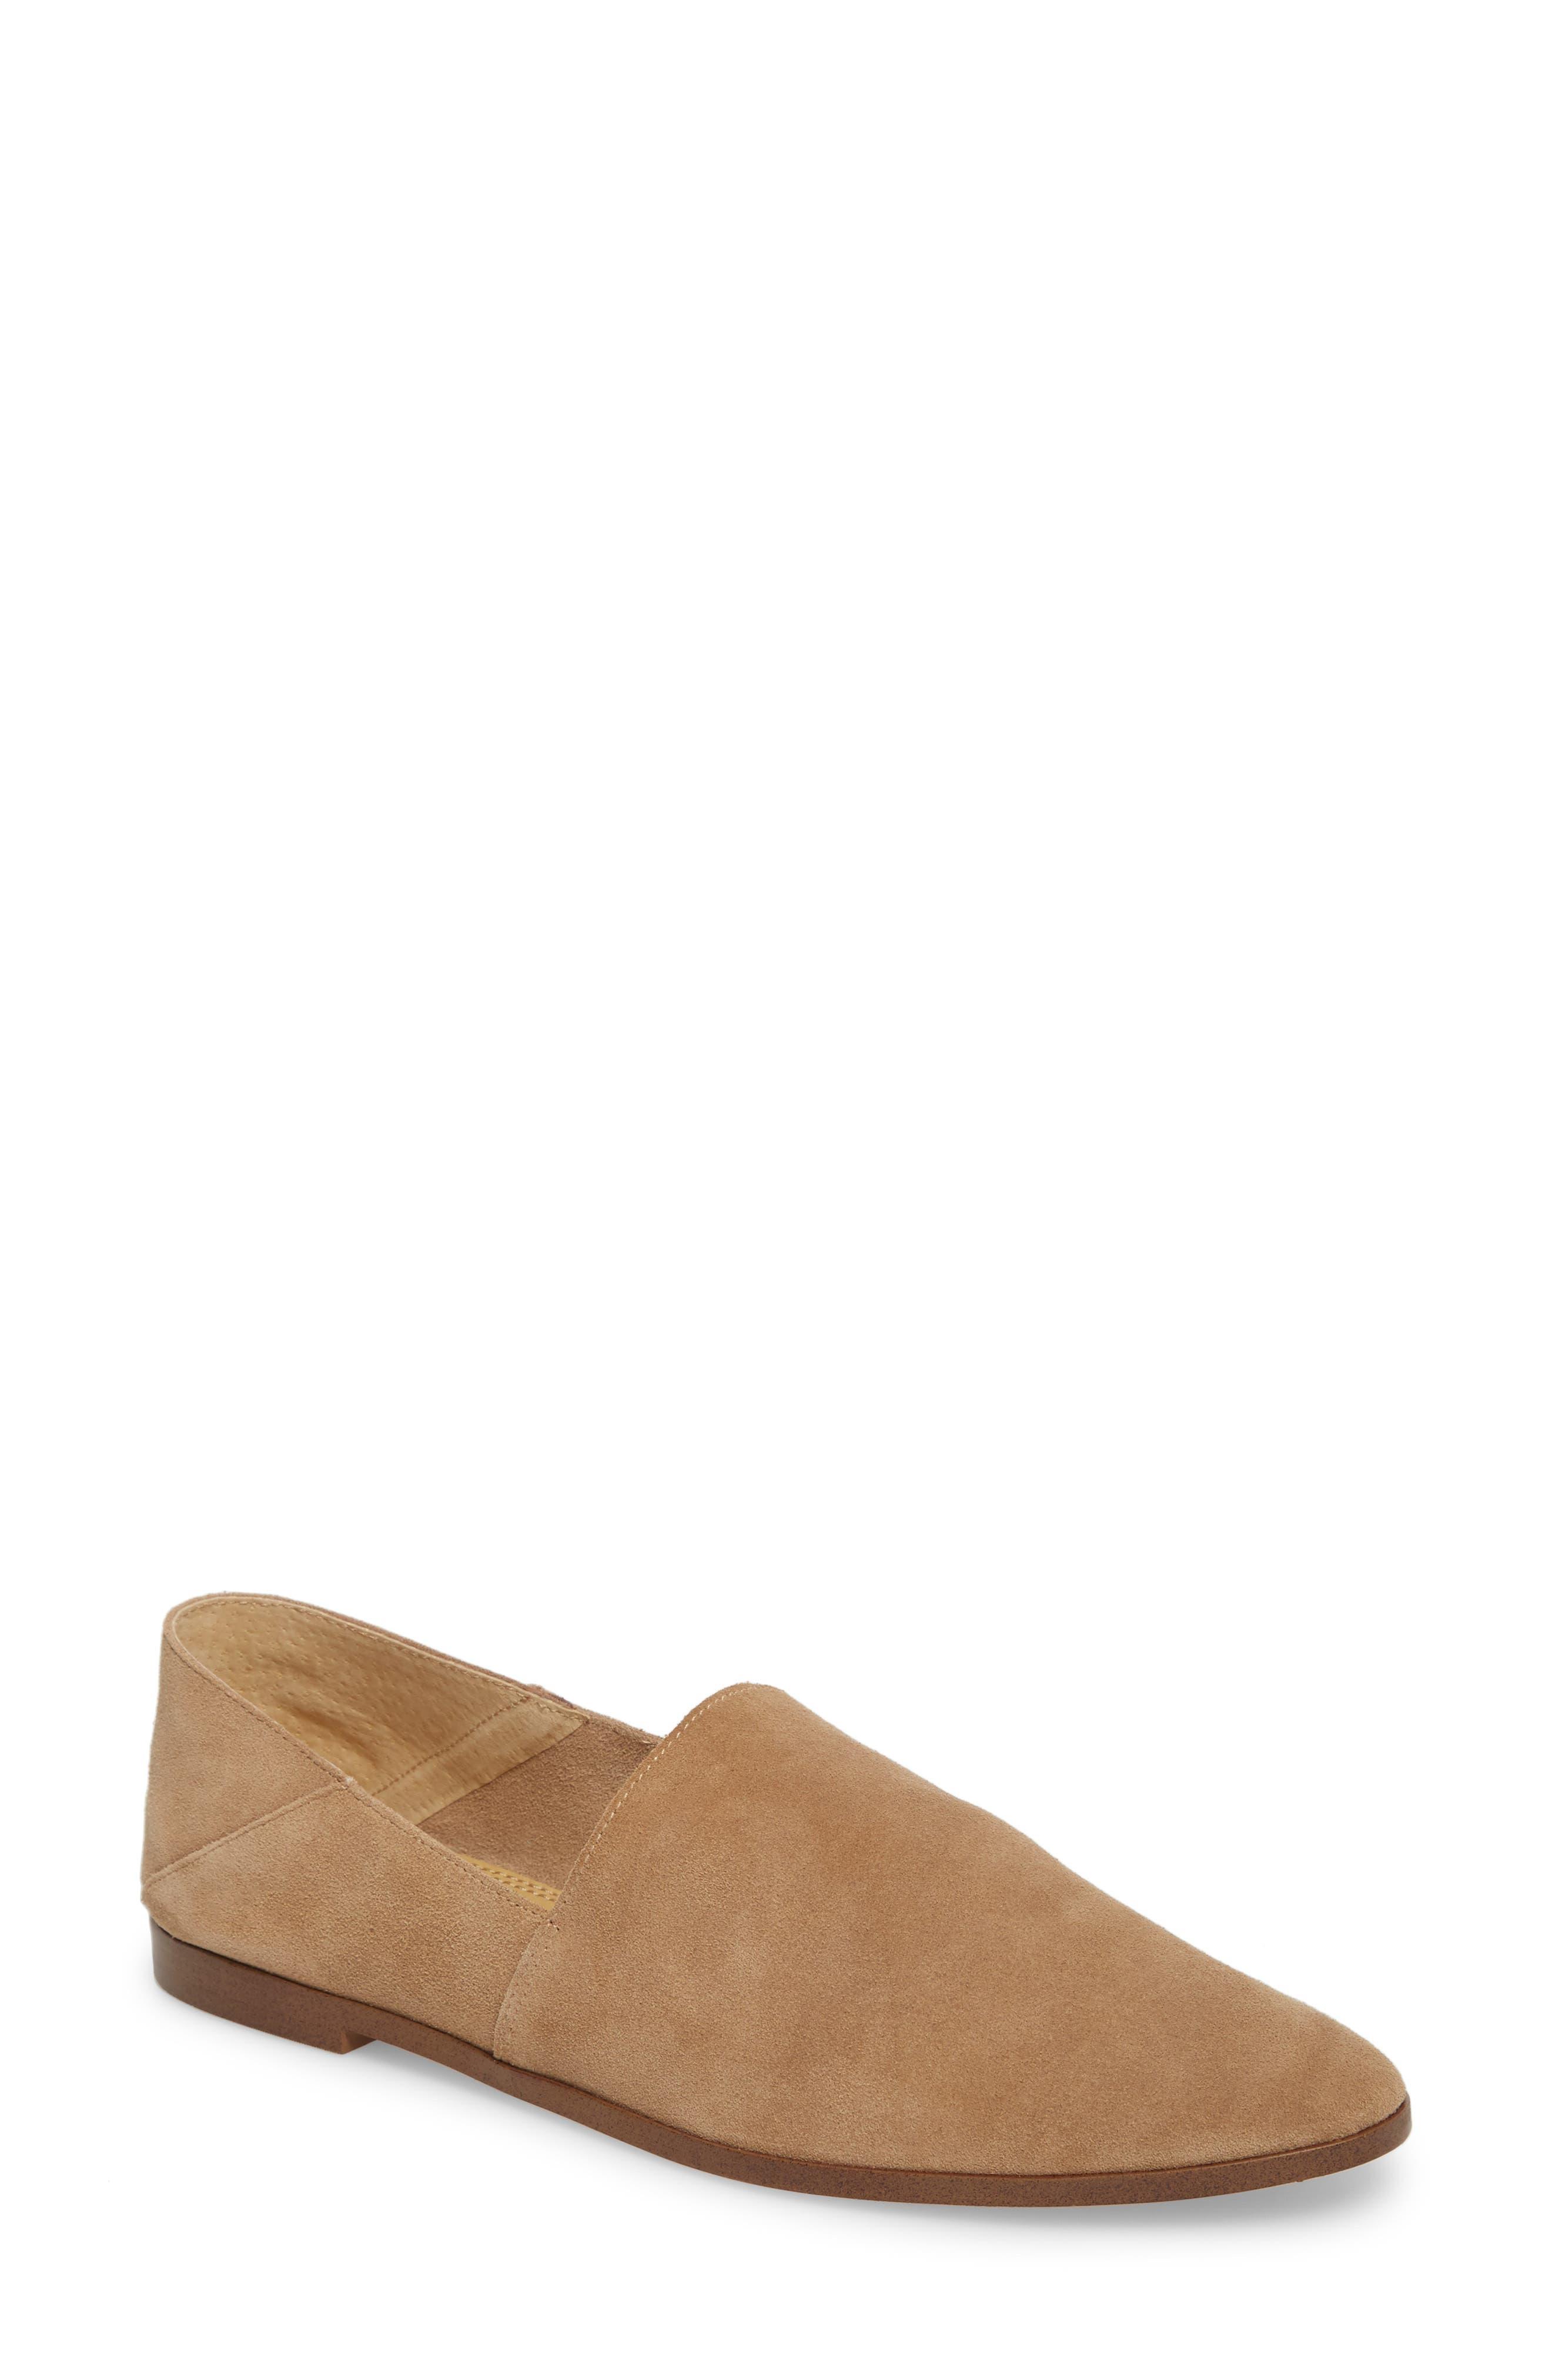 Babette Almond Toe Flat,                             Main thumbnail 1, color,                             Light Taupe Suede